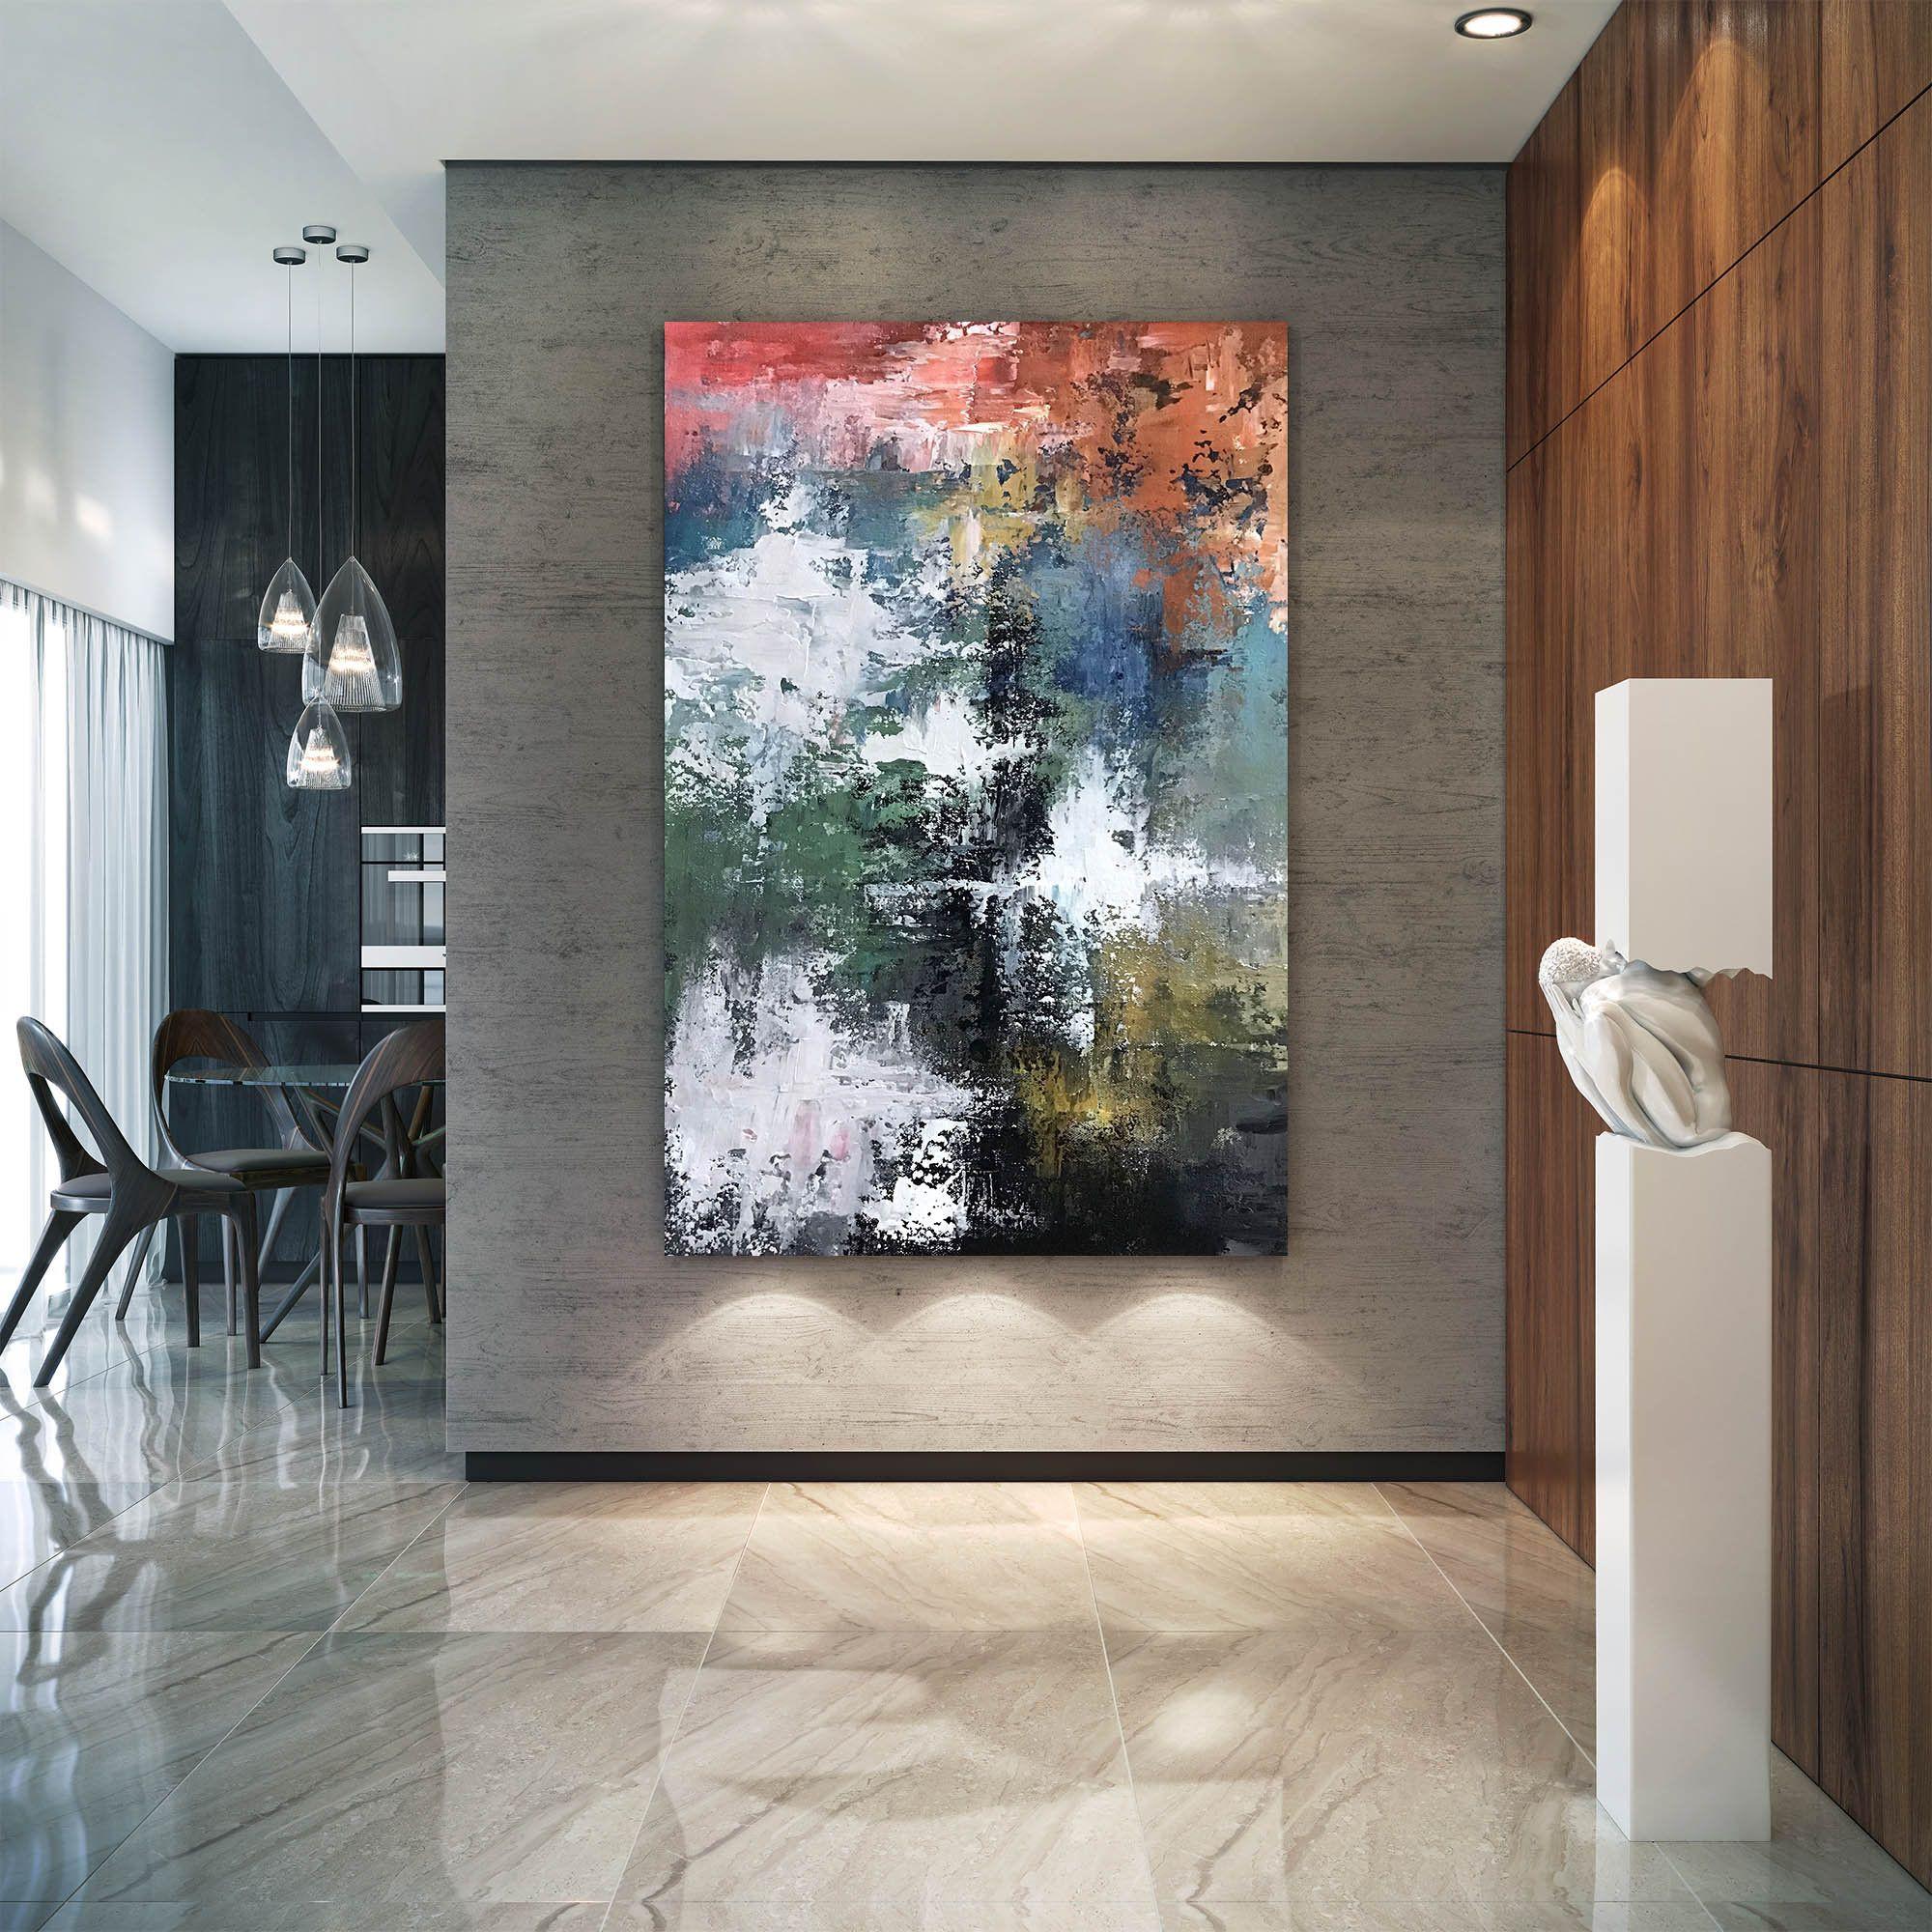 Large Modern Wall Art Paintingmaster Bedroom Decorpainting Etsy Large Abstract Wall Art Large Modern Wall Art Extra Large Wall Art